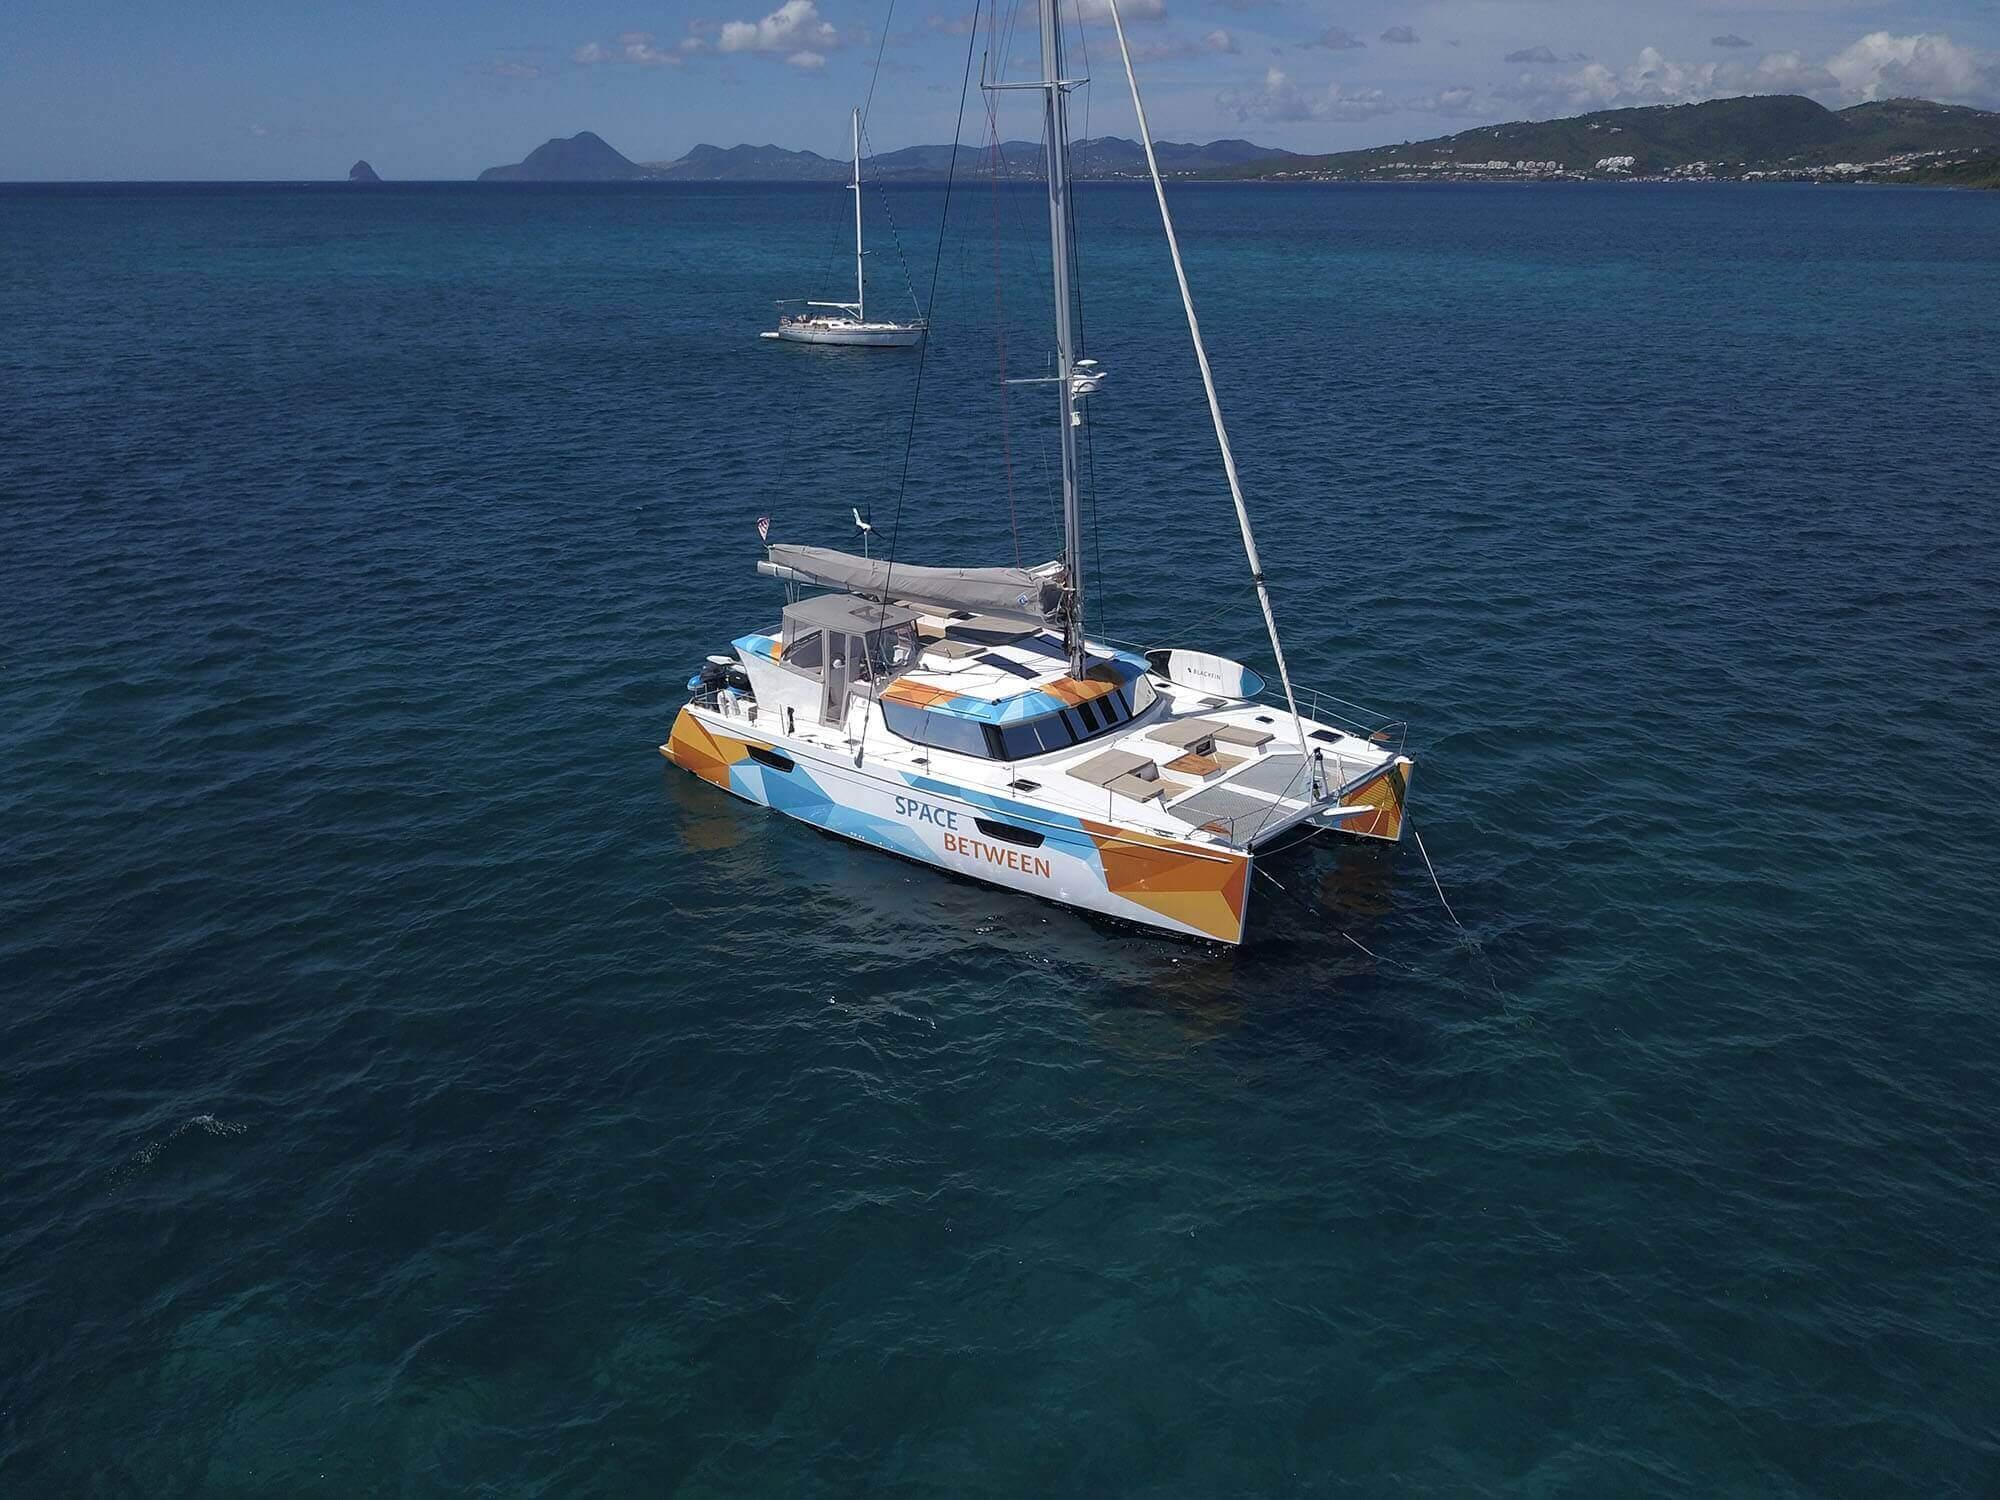 Used Sail Catamaran for Sale 2018 Saba 50 Boat Highlights